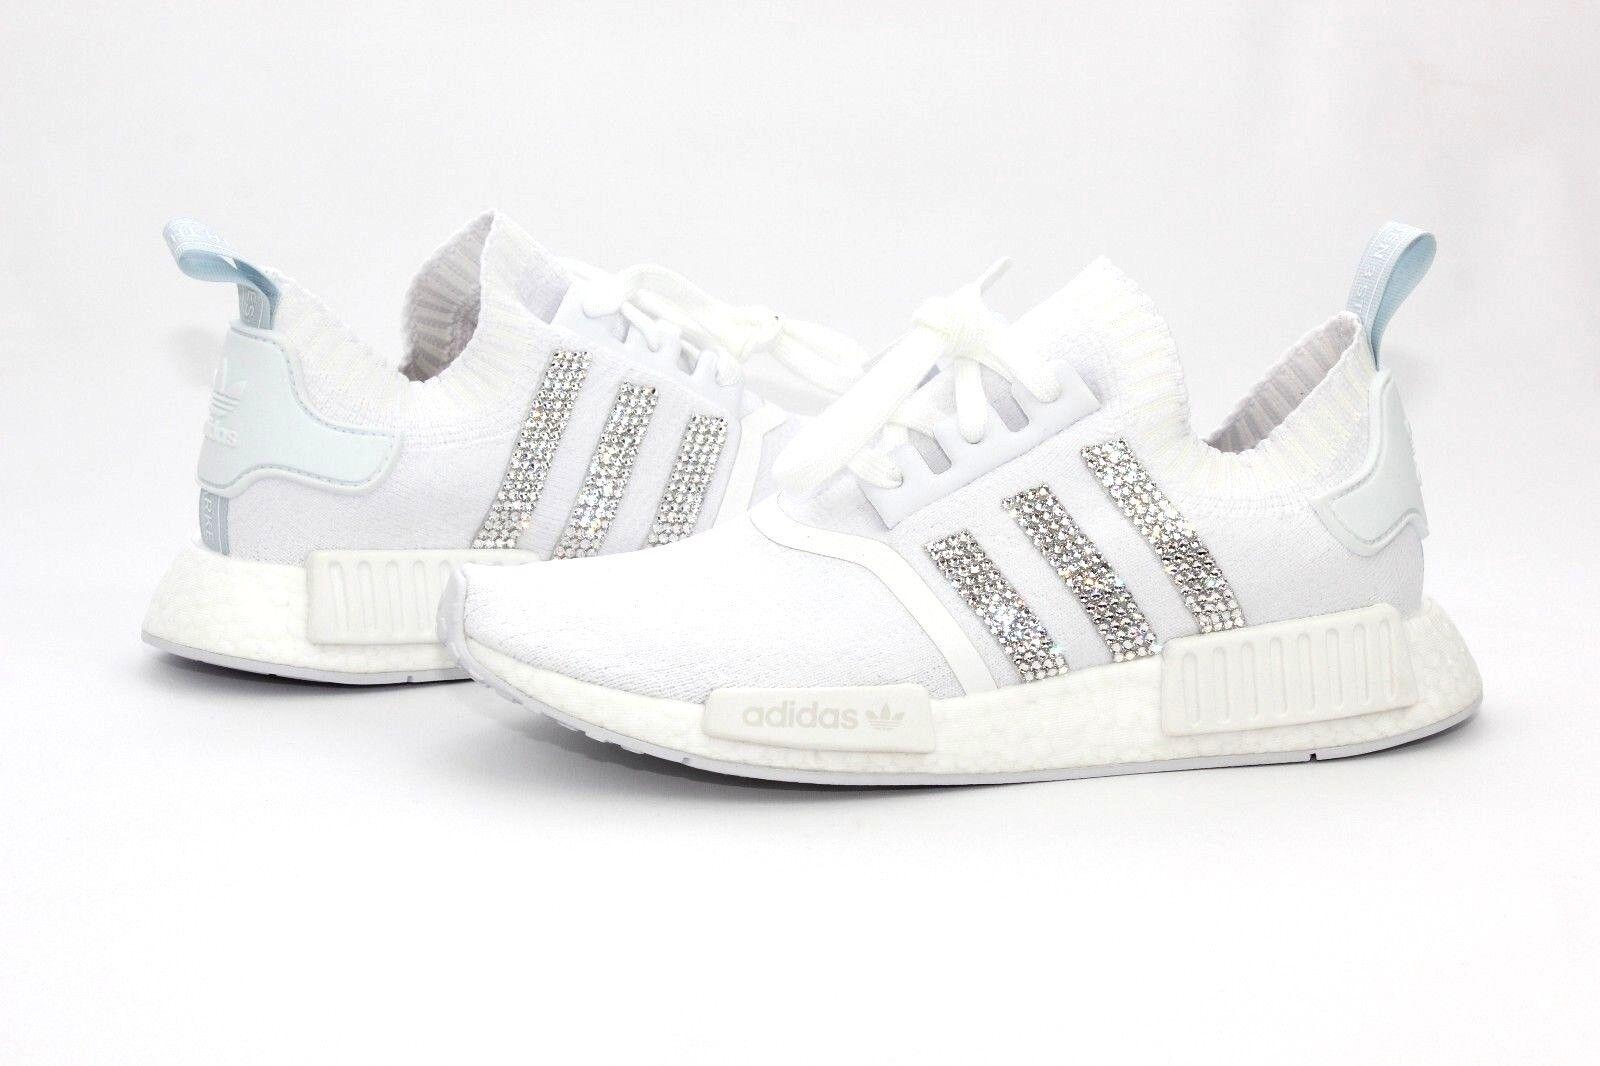 75141ad8927d adidas Custom Bling NMD R1 PK Cloud White Blue Tint Womens Size 8 US ...